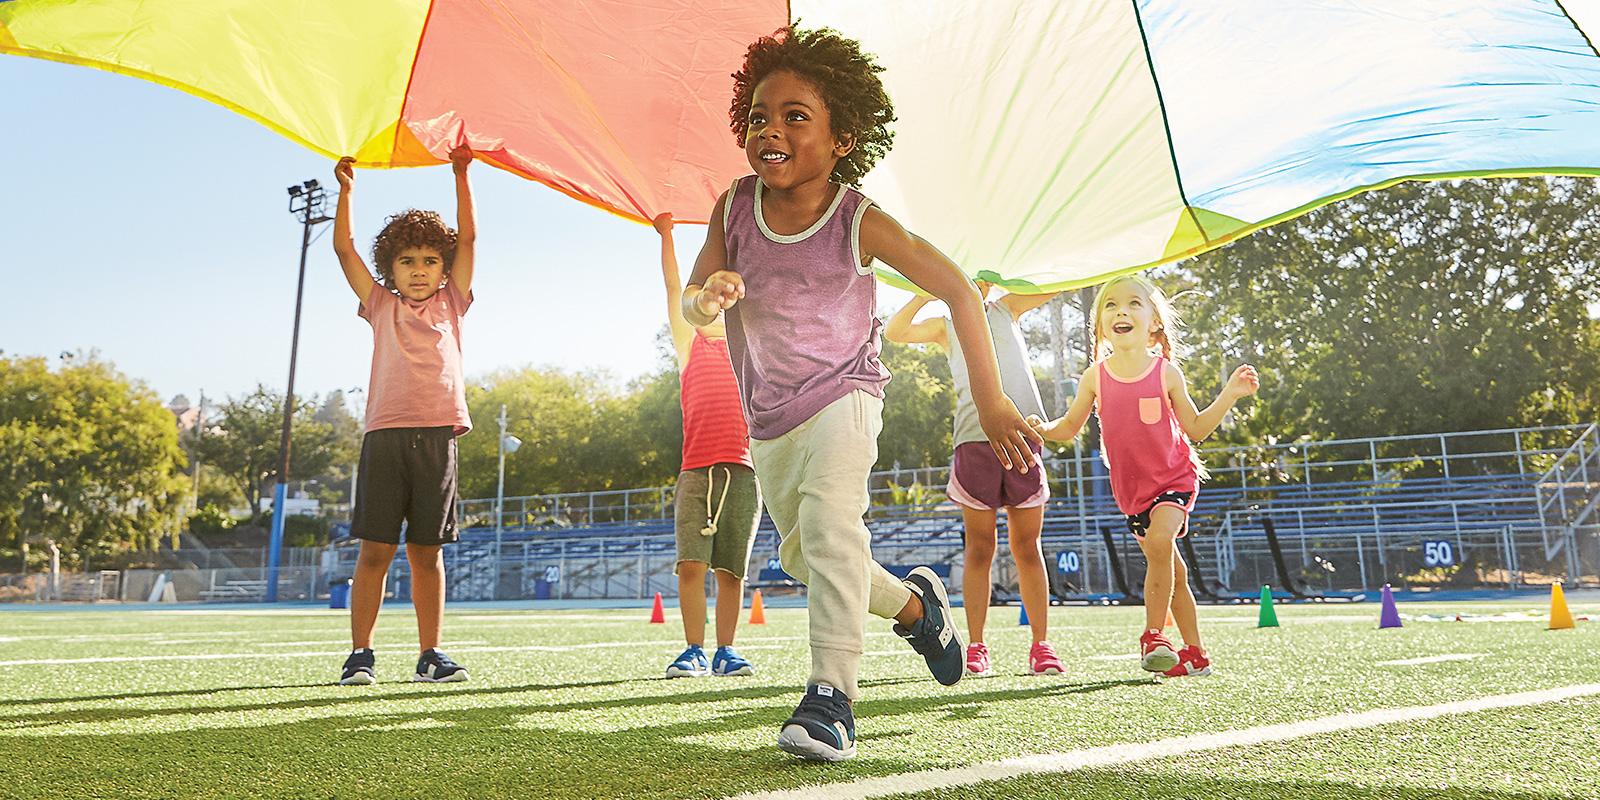 Kids playing under a rainbow parachute.